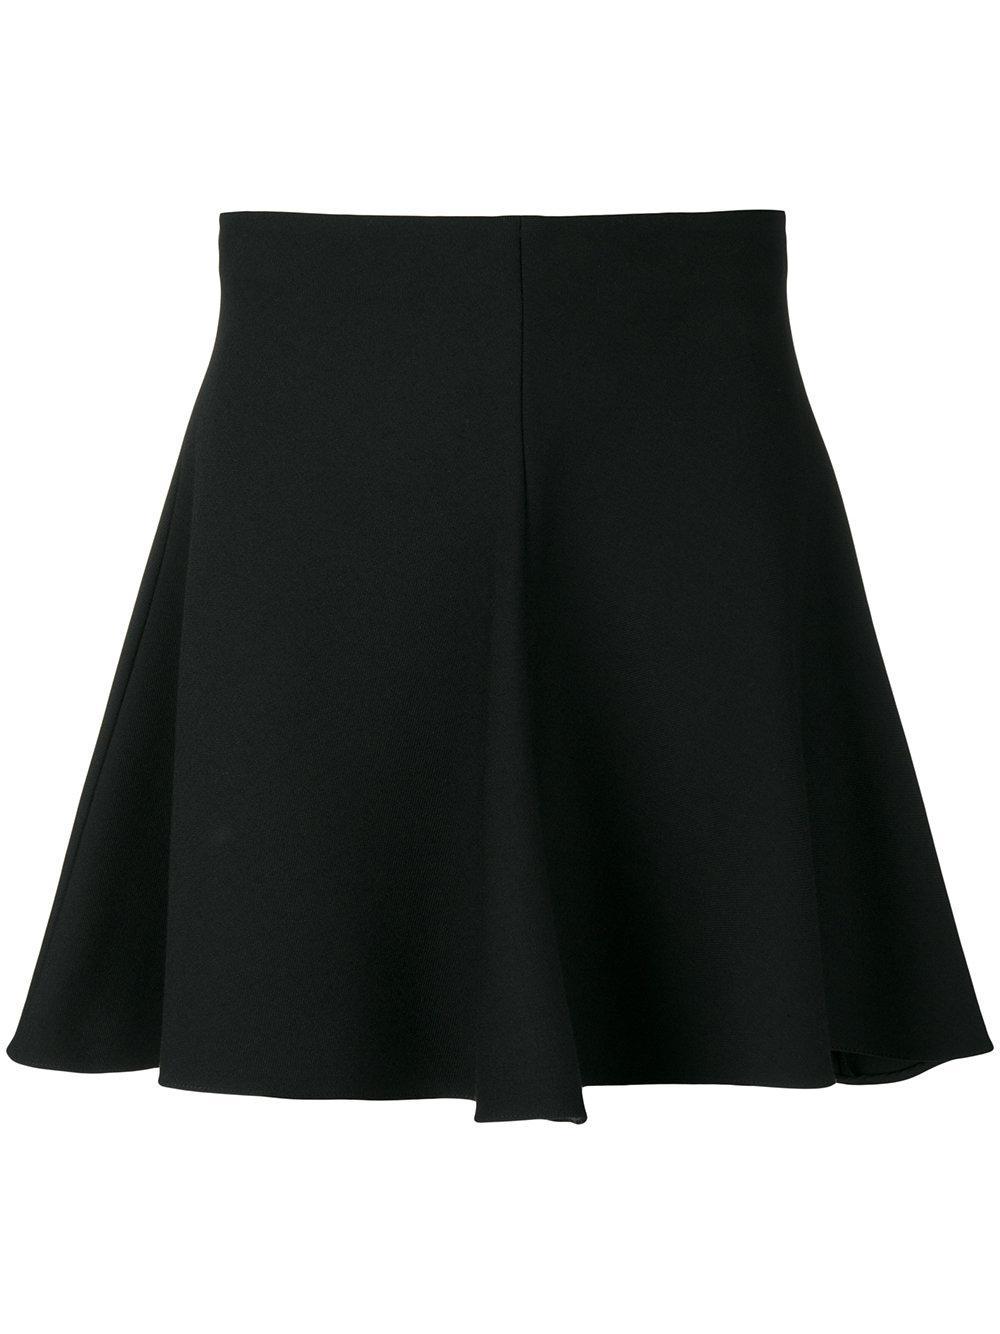 Forever 21 Women's Medium Cotton Mini Skater Skirt Black Circle Skirt. Pre-Owned. $ or Best Offer. Free Shipping. Old Navy Black Scallop Hem Eyelet Cotton Skater Skirt Womens sz XS. Pre-Owned. $ Guaranteed by Mon, Oct. Buy It Now. Free Shipping.